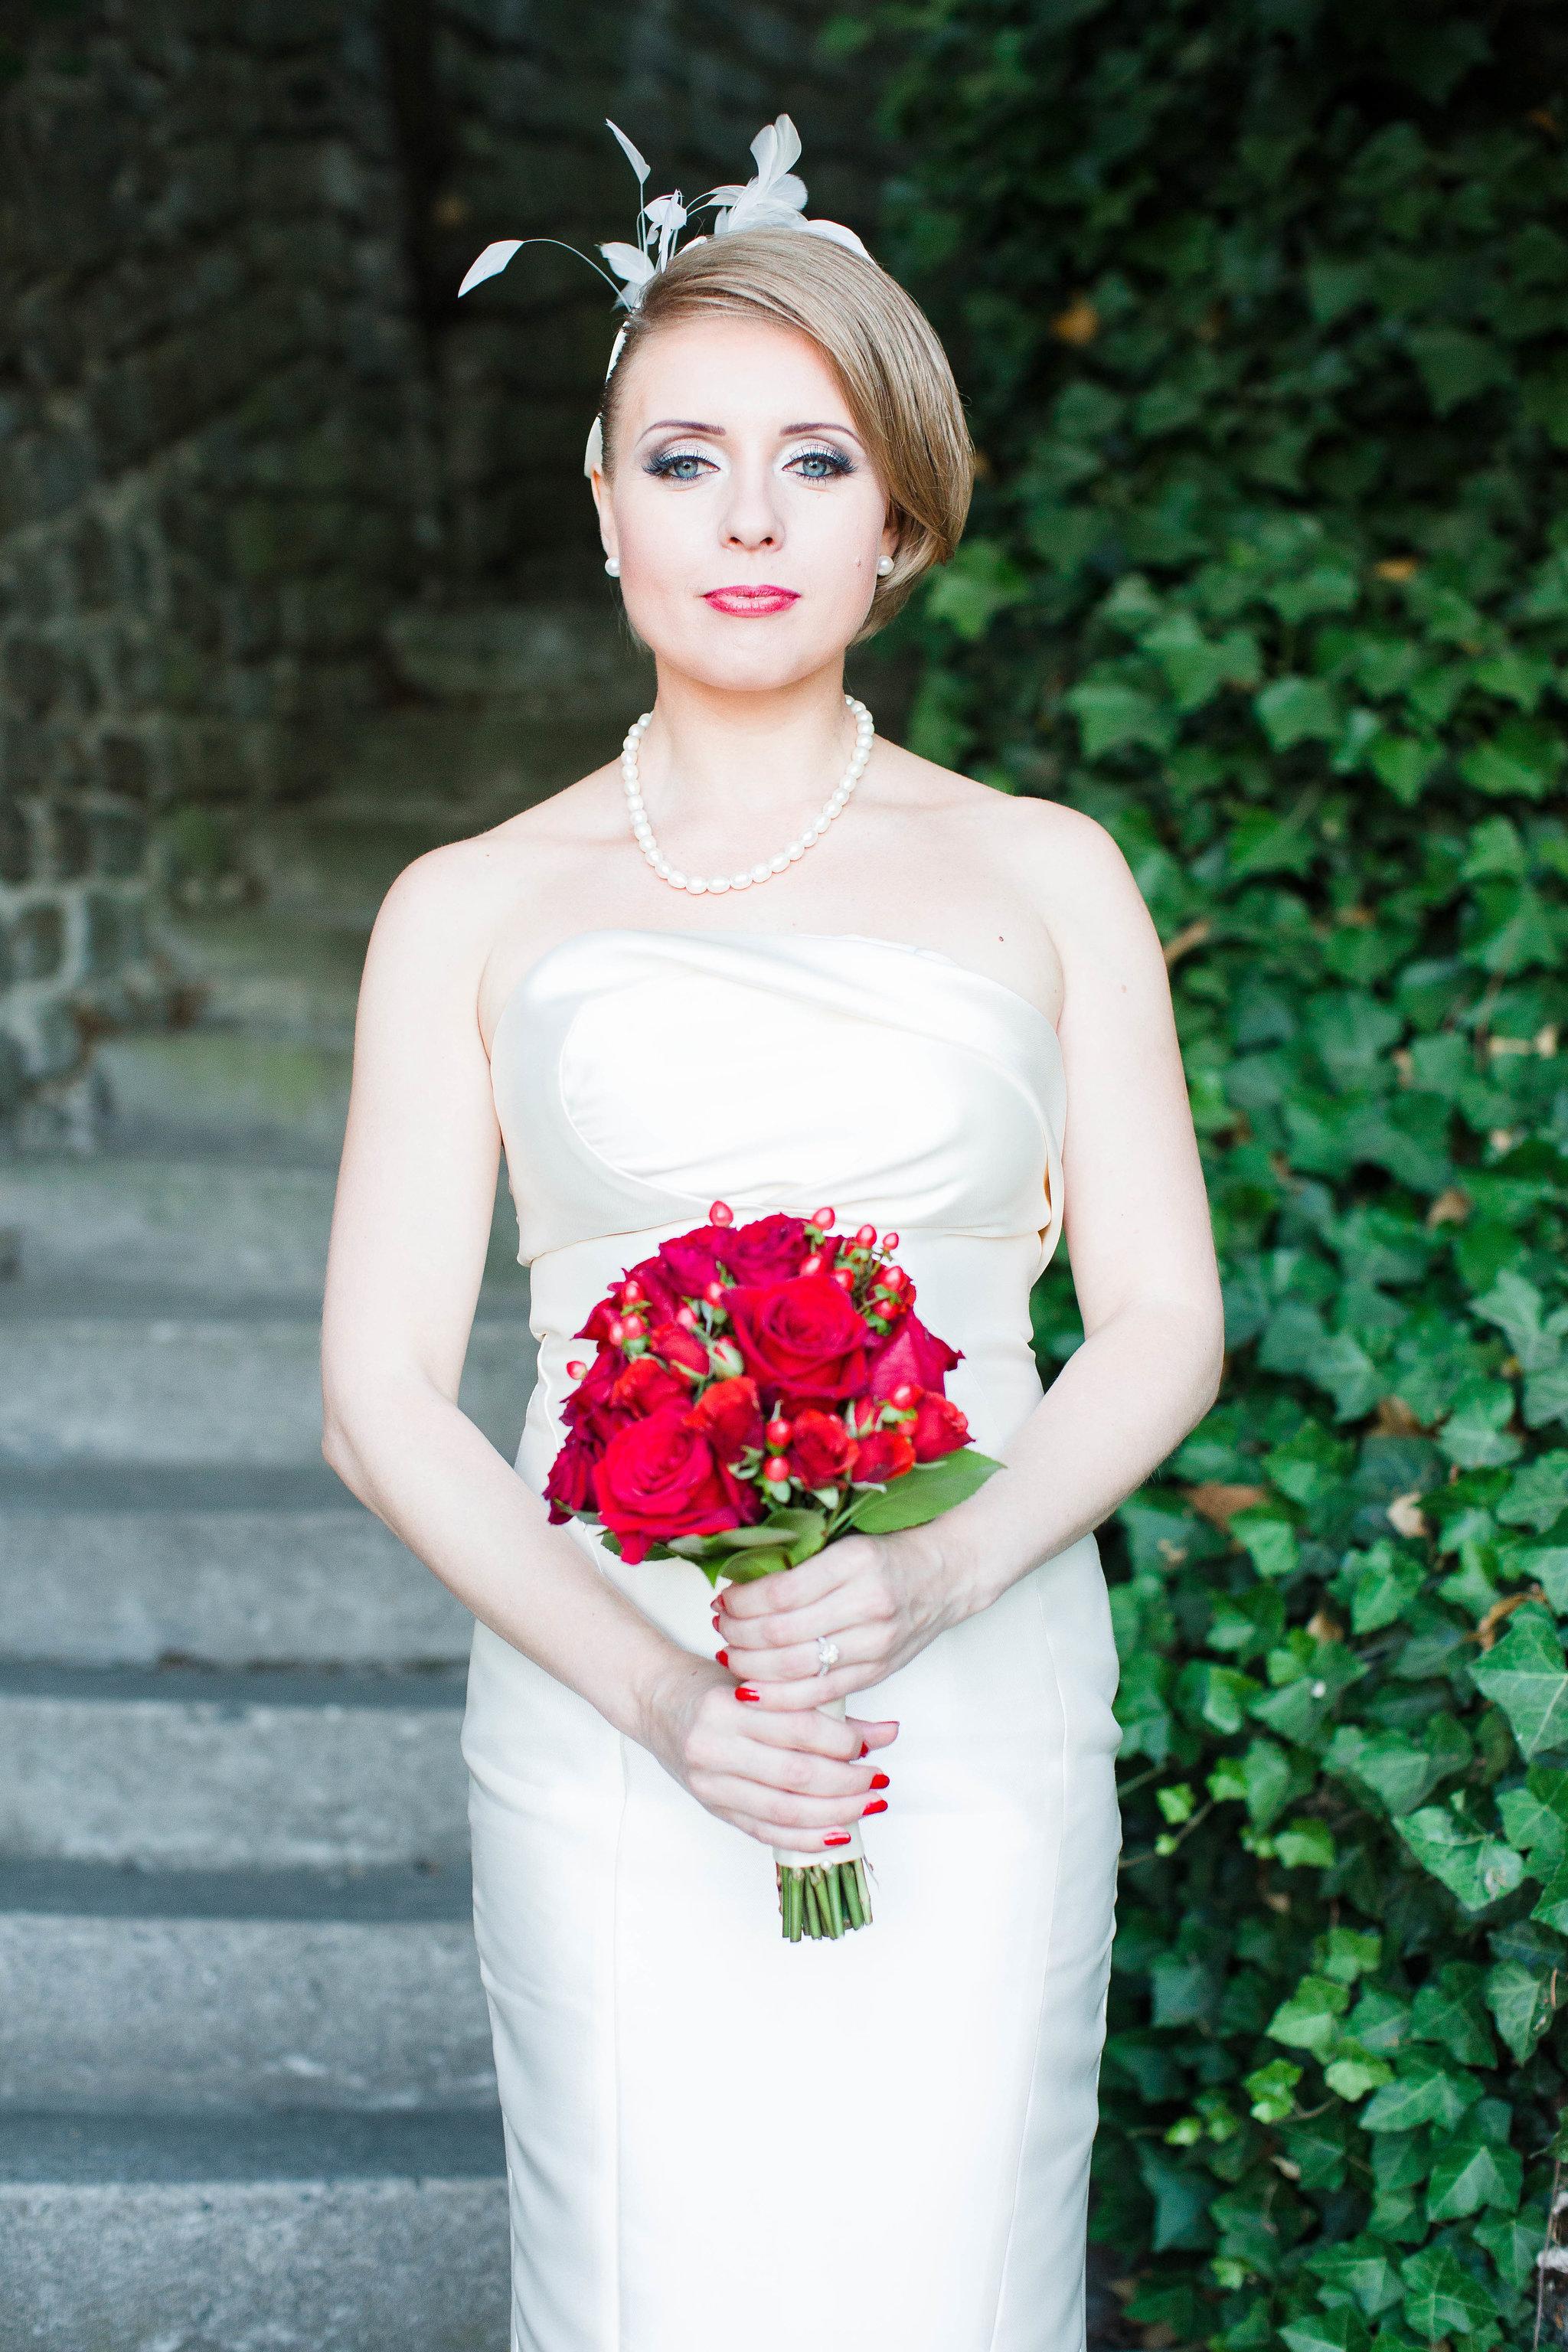 medina-wedding-seattle-by-seattle-wedding-photographer-adina-preston-2.jpg